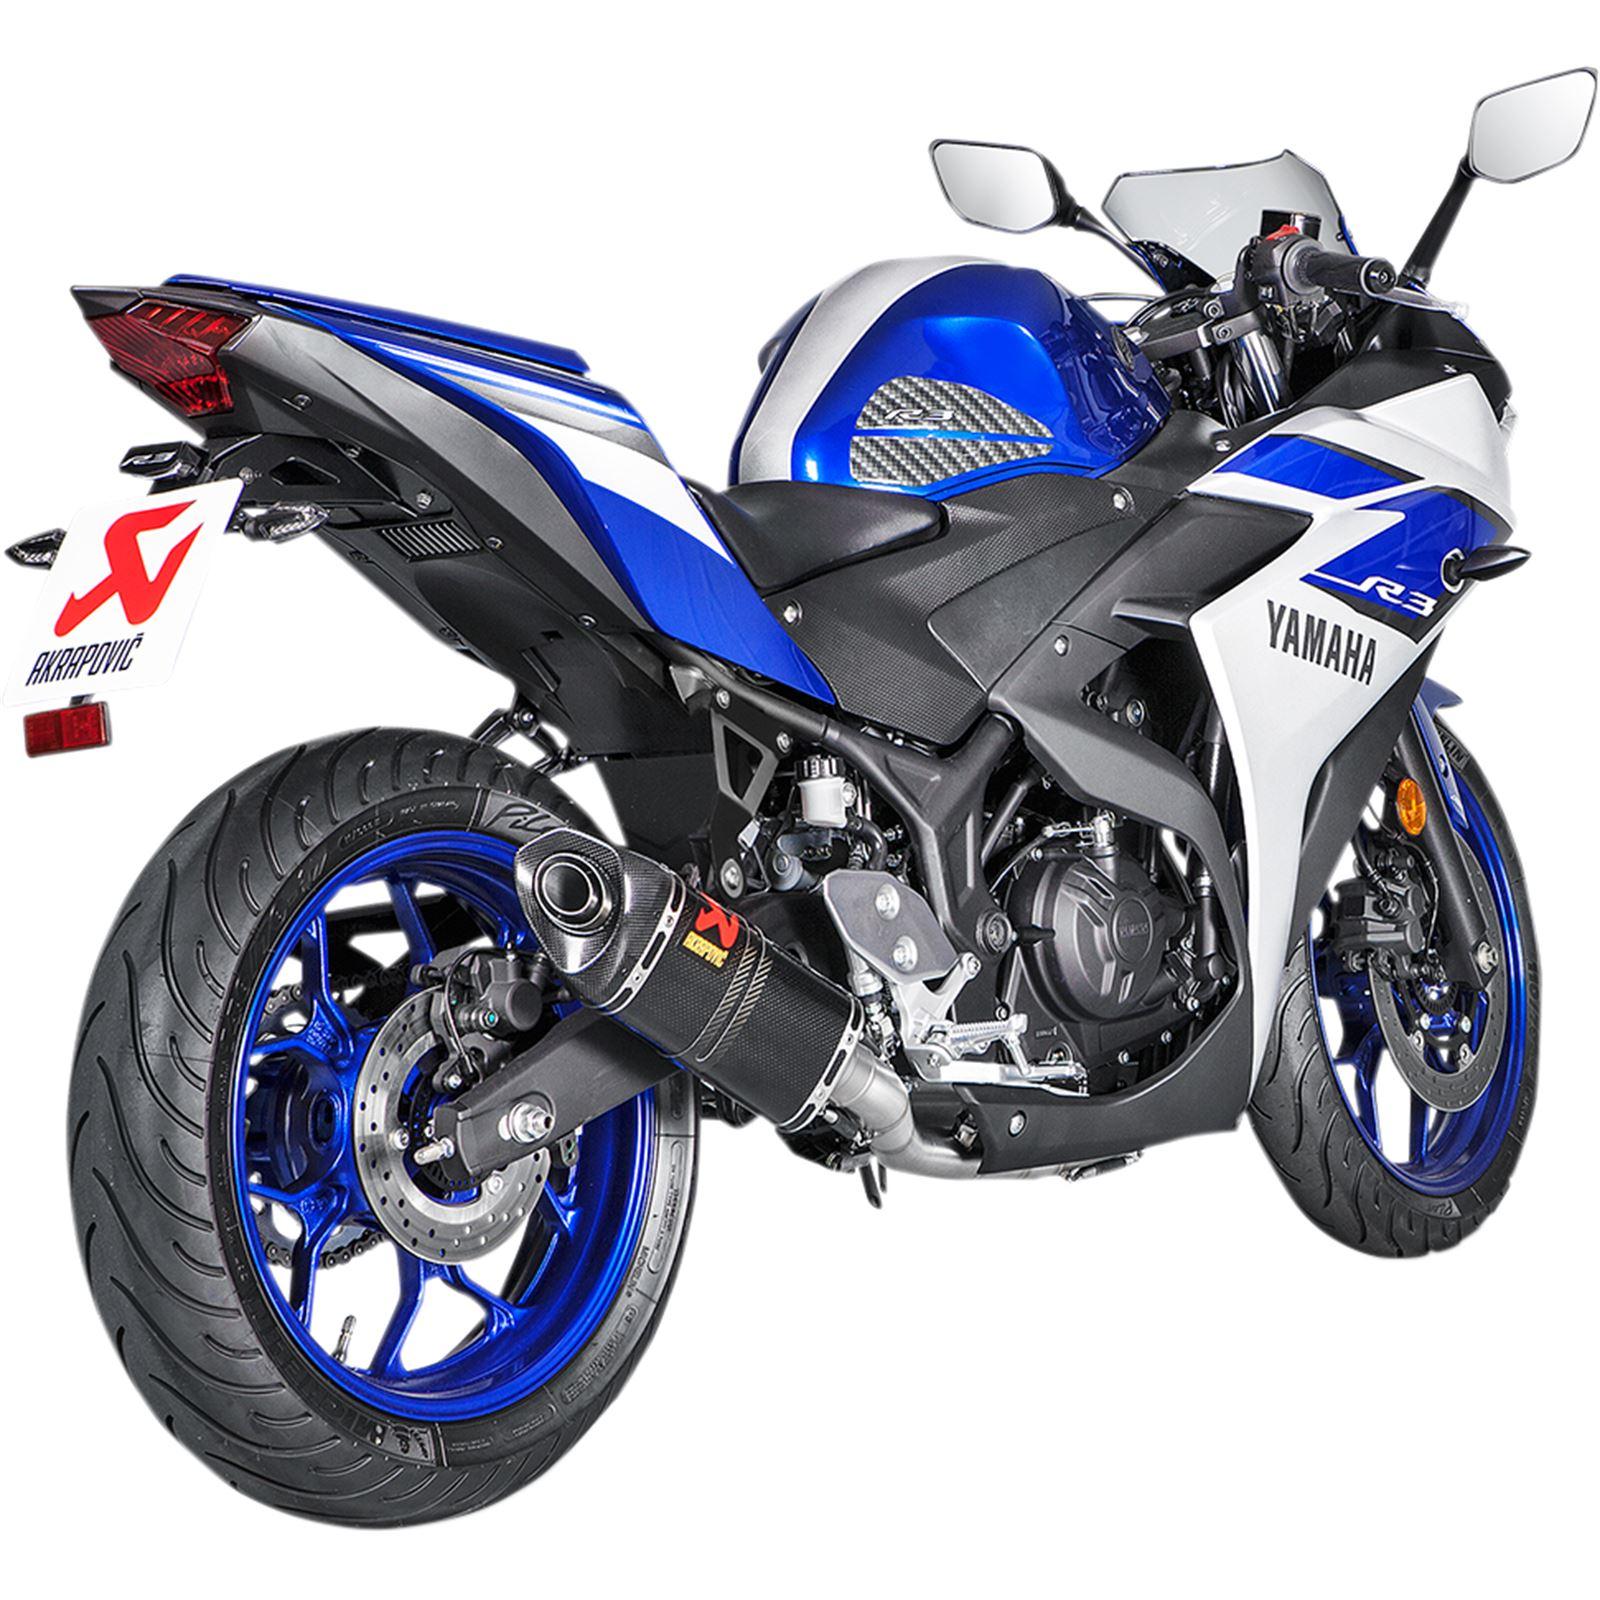 Akrapovic Race Exhaust - Carbon Fiber